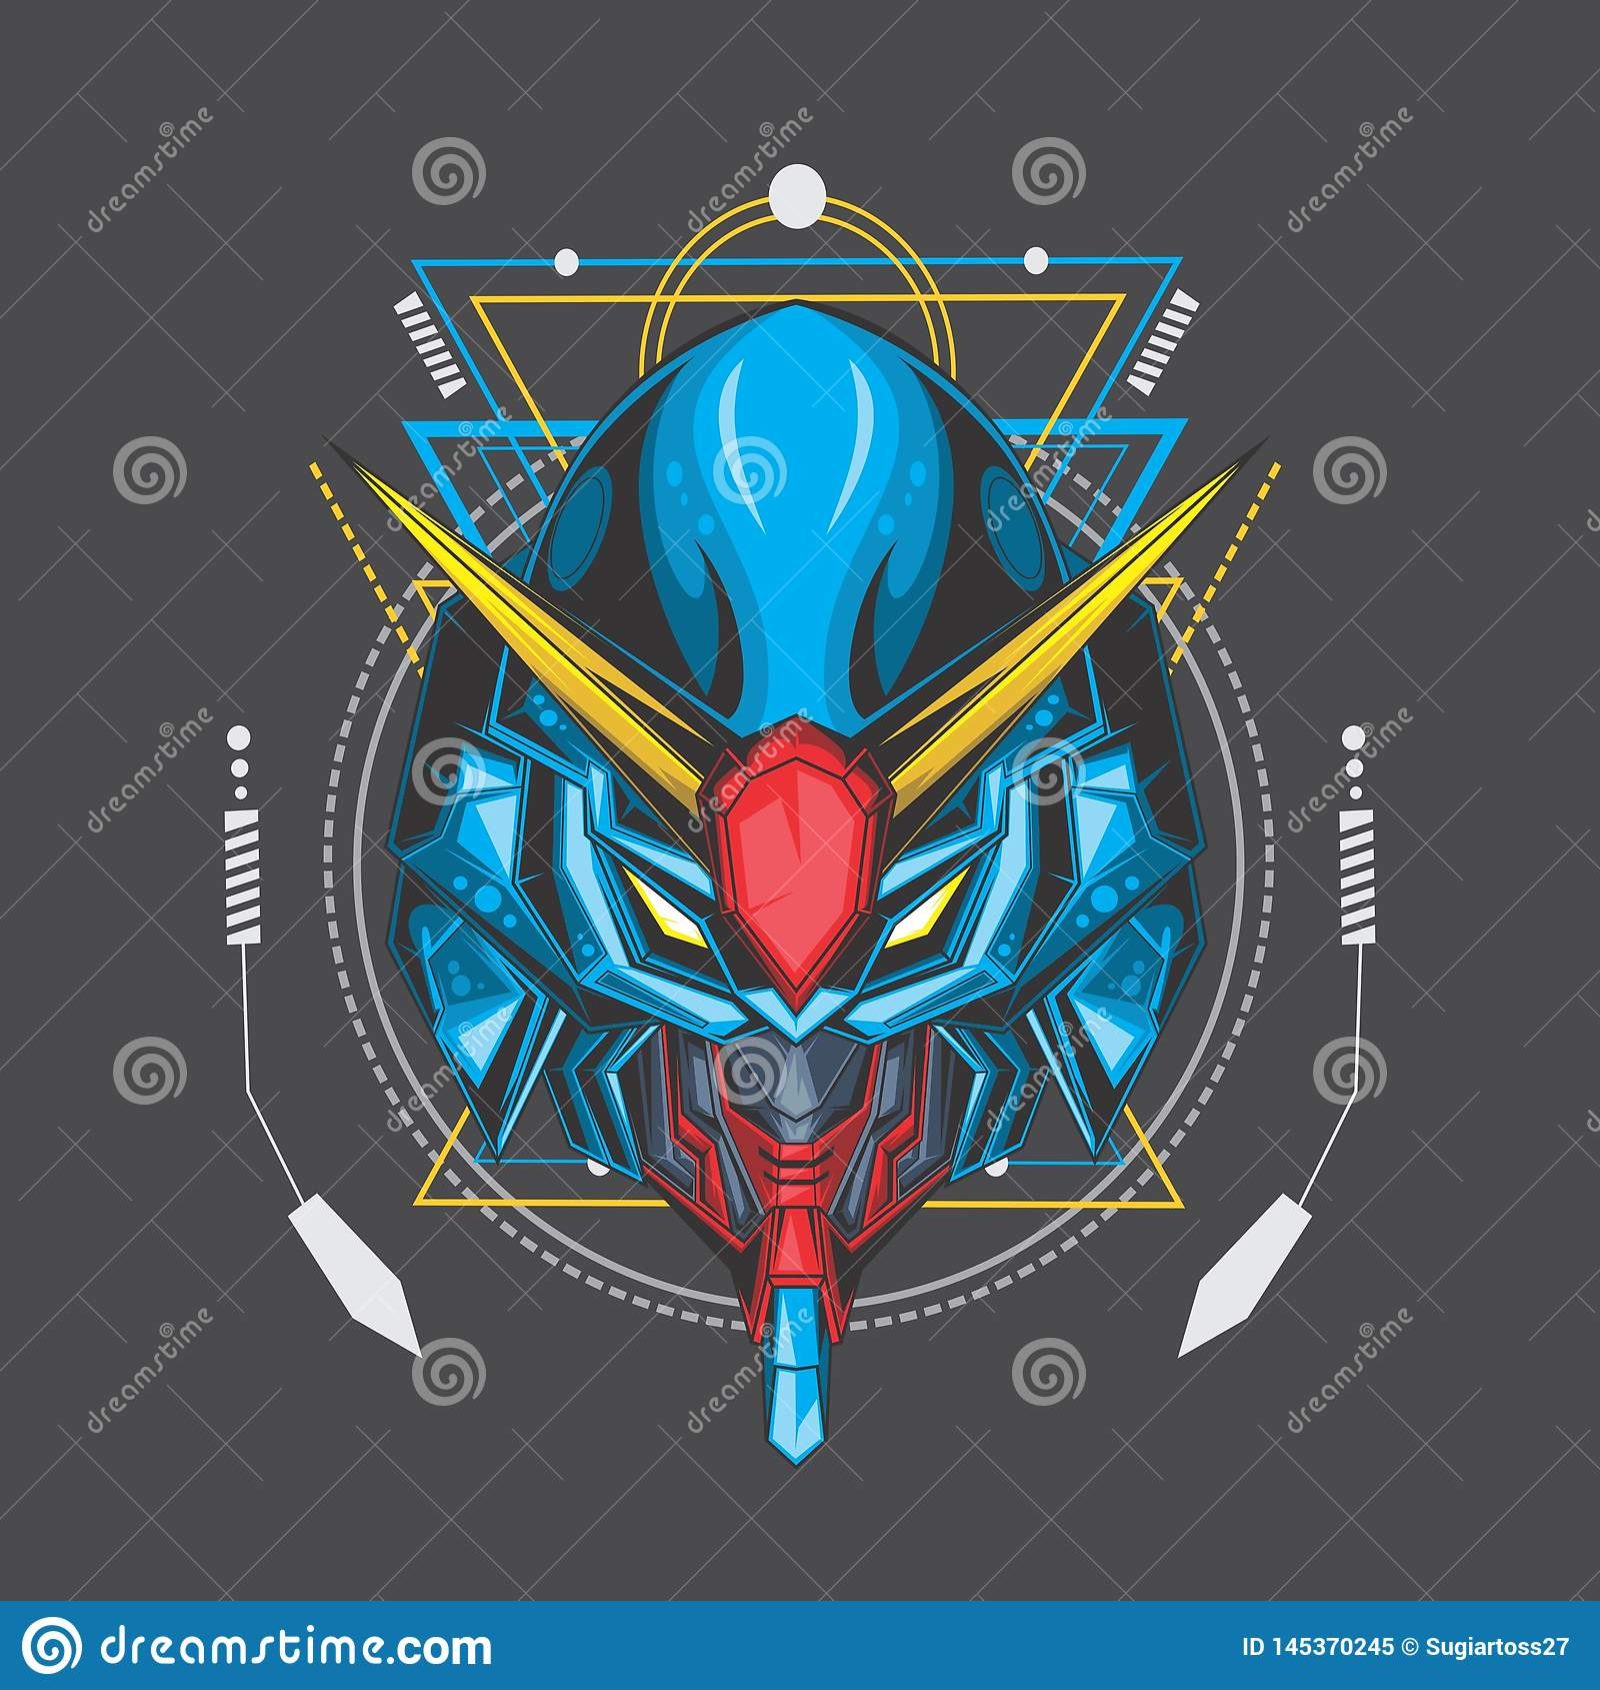 blue ocean gundam and sacred geometry